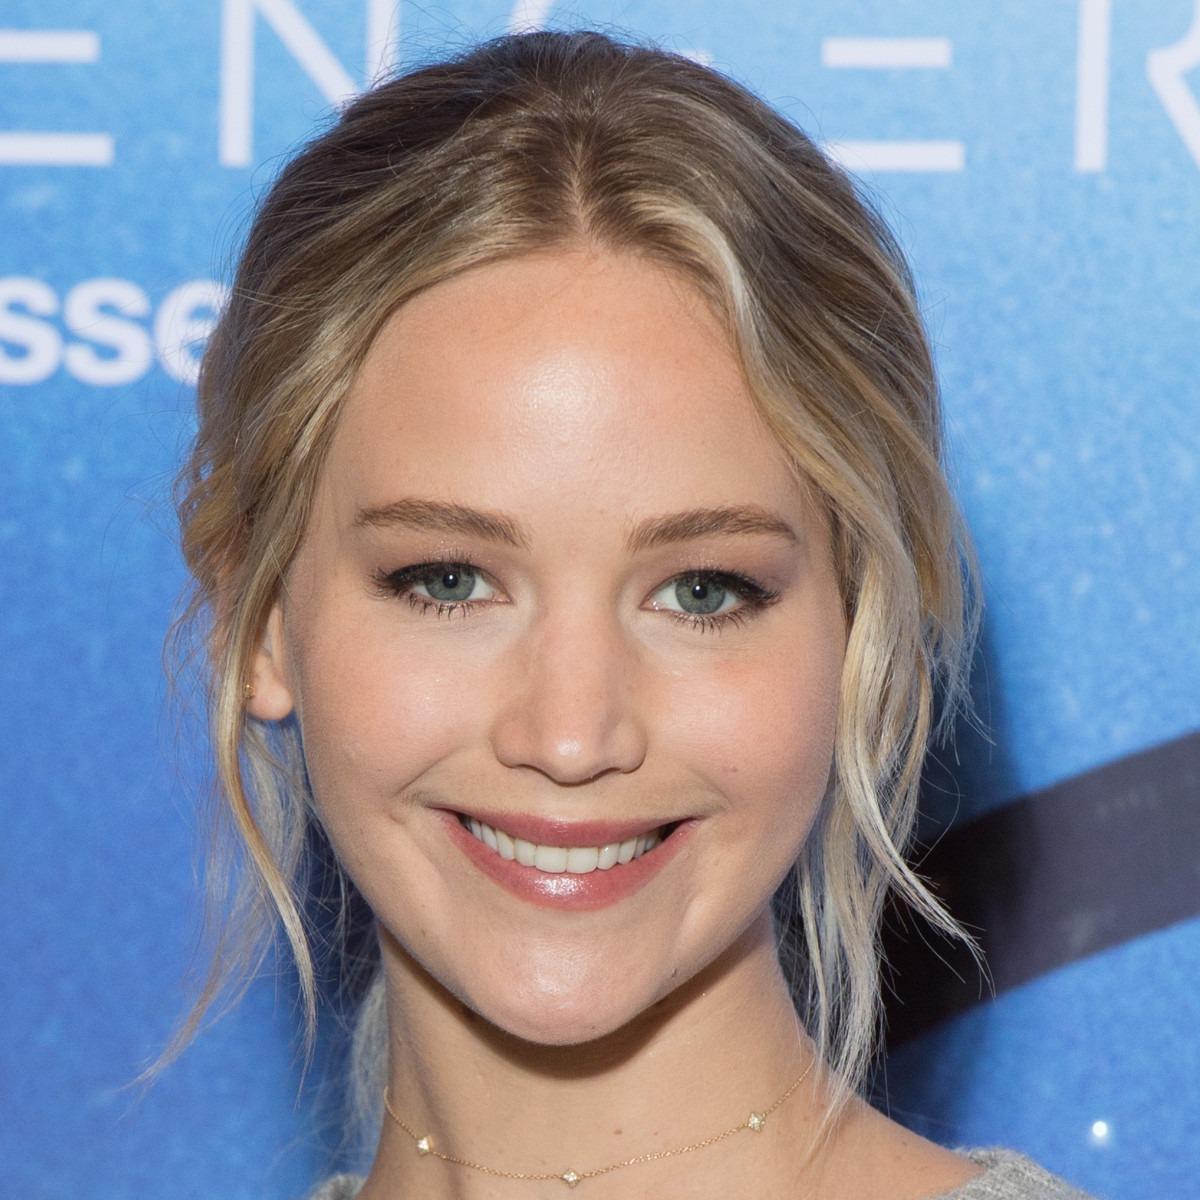 A natural blonde - Jennifer Lawrence No Makeup - All Ravishing Pics